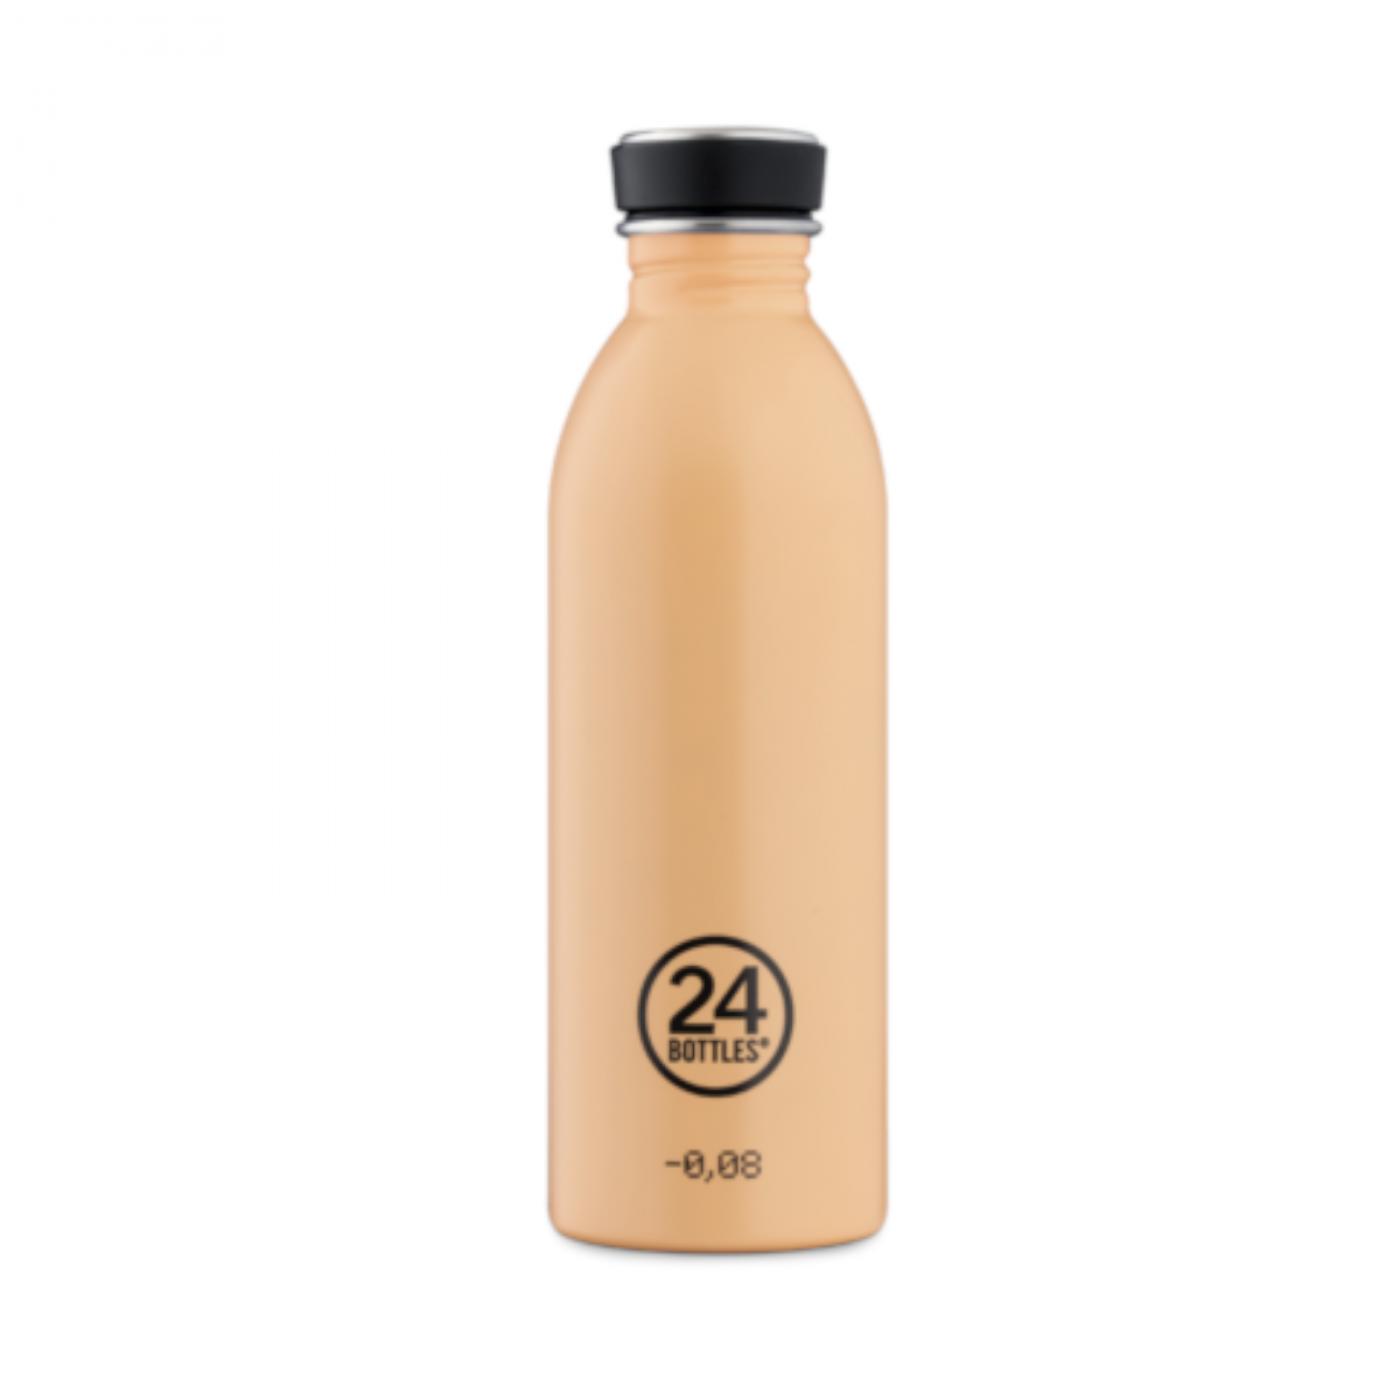 24 BOTTLES Urban Peach Orange, bottiglia in acciaio inox, 500 ml